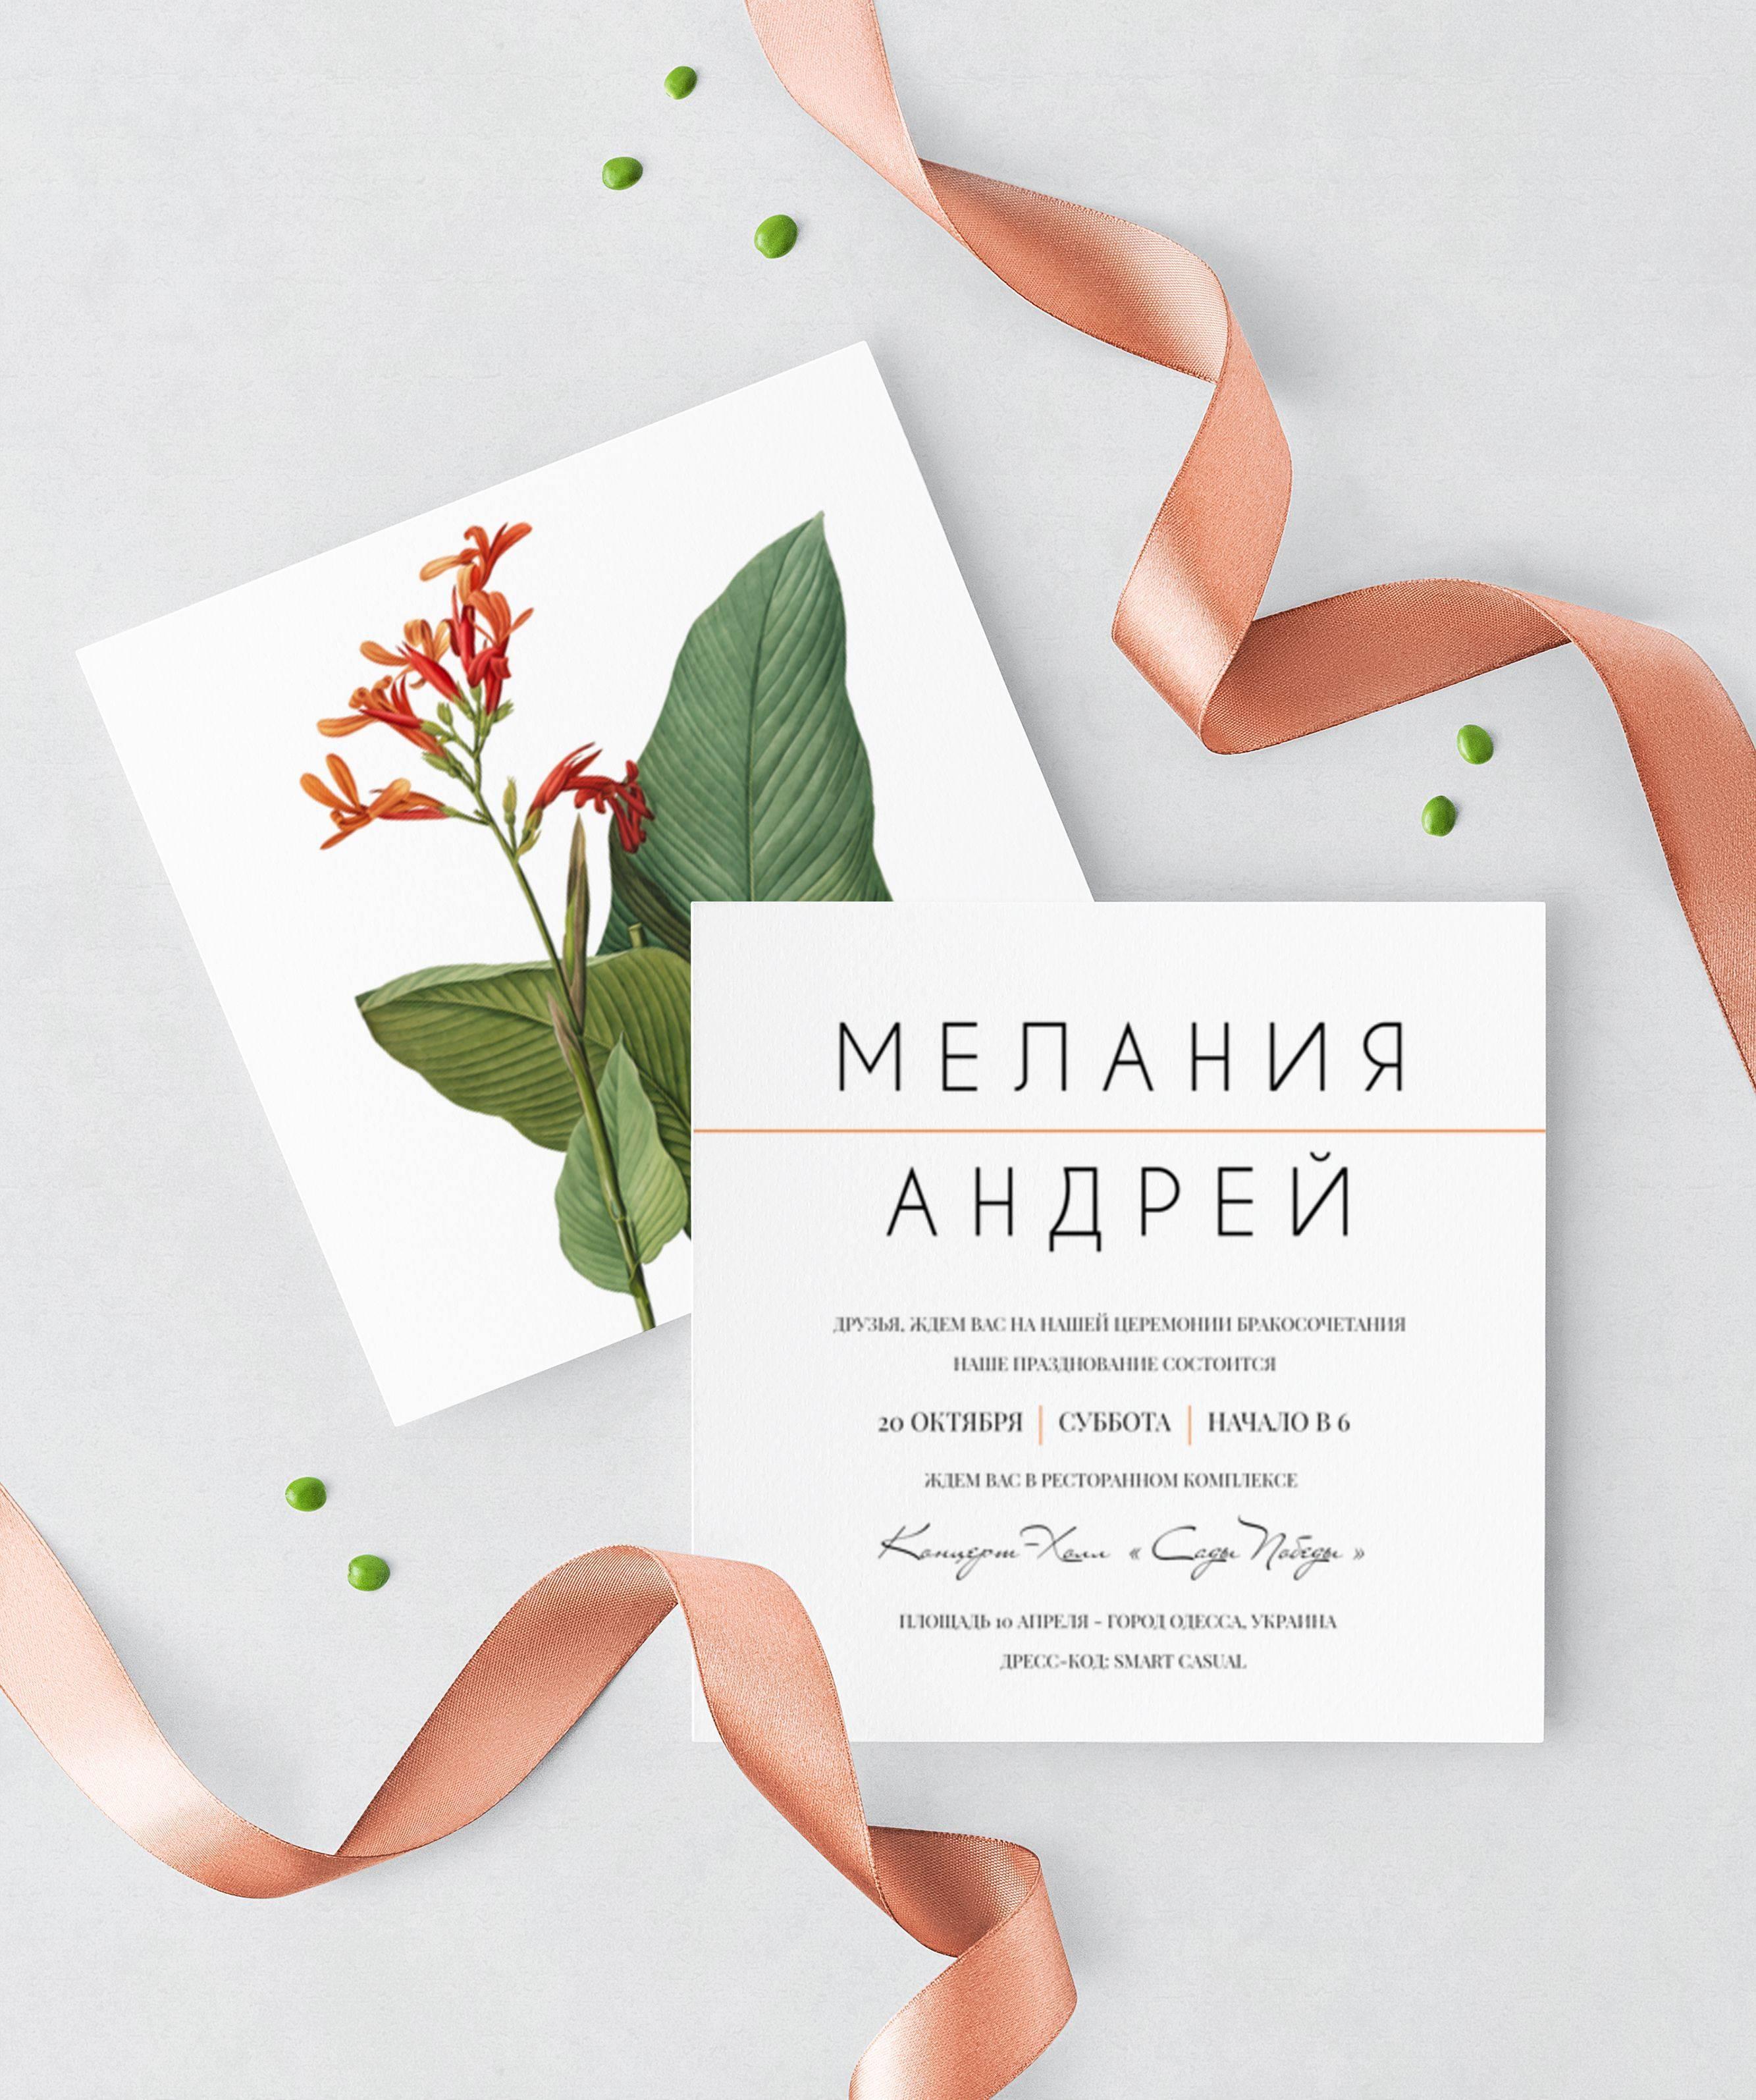 Создание приглашения онлайн